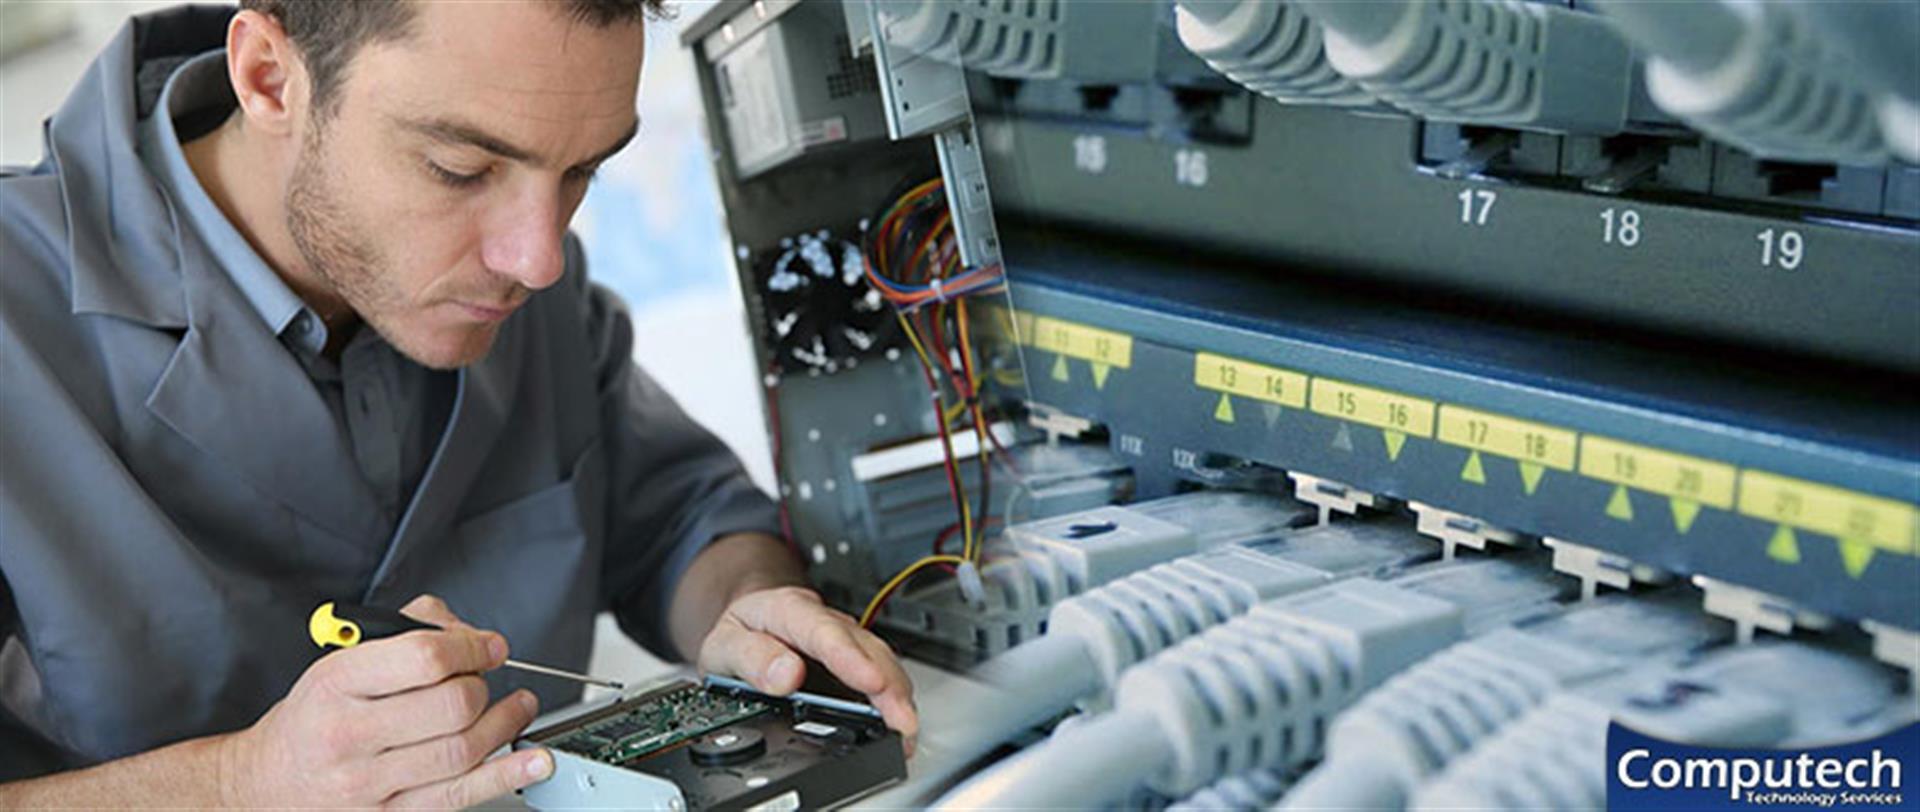 Pelham Georgia On Site Computer & Printer Repair, Networking, Voice & Data Cabling Contractors